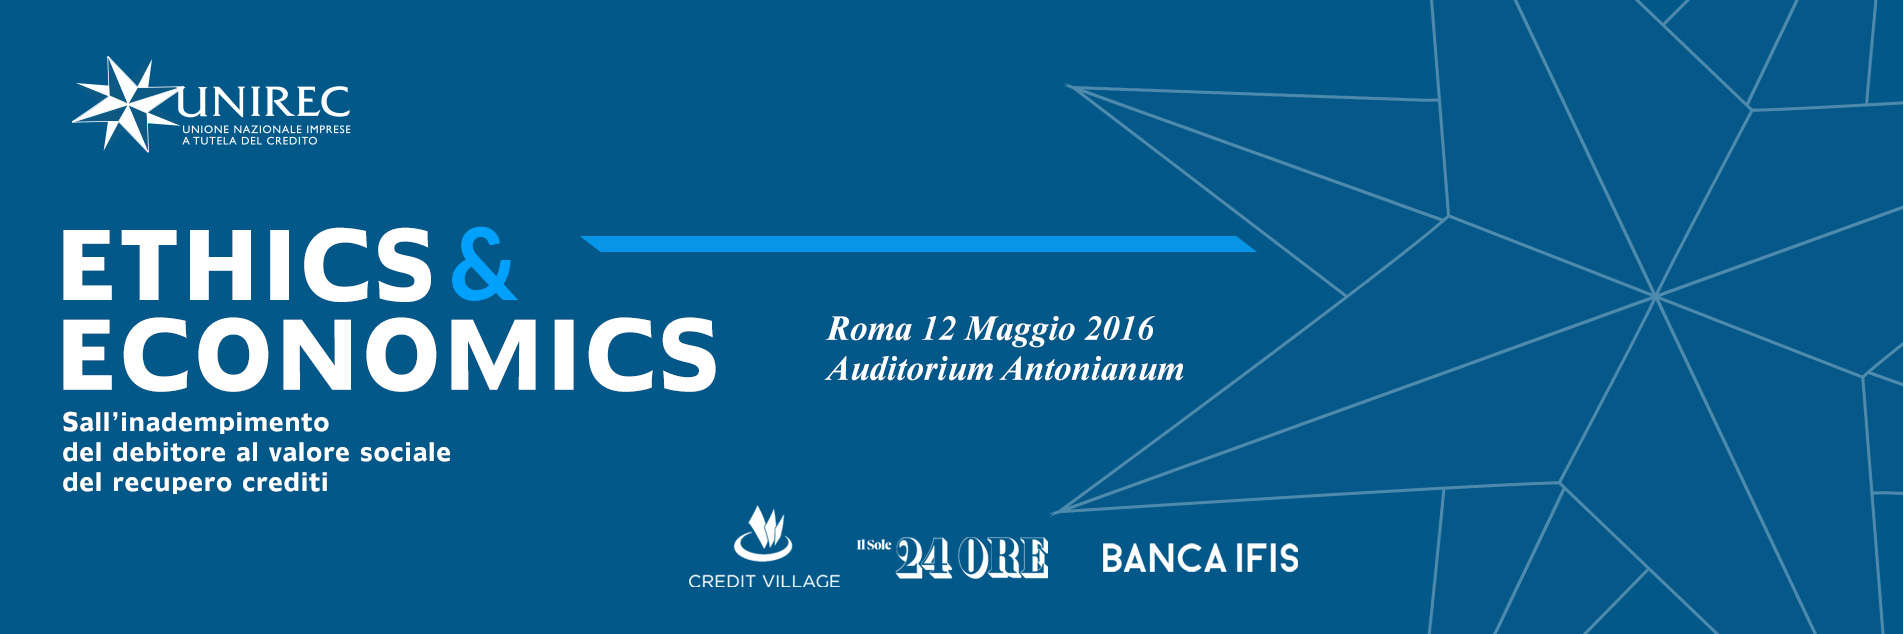 VI Annual Report UNIREC (National Credit Protection Companies Union) - Ethics & Economics